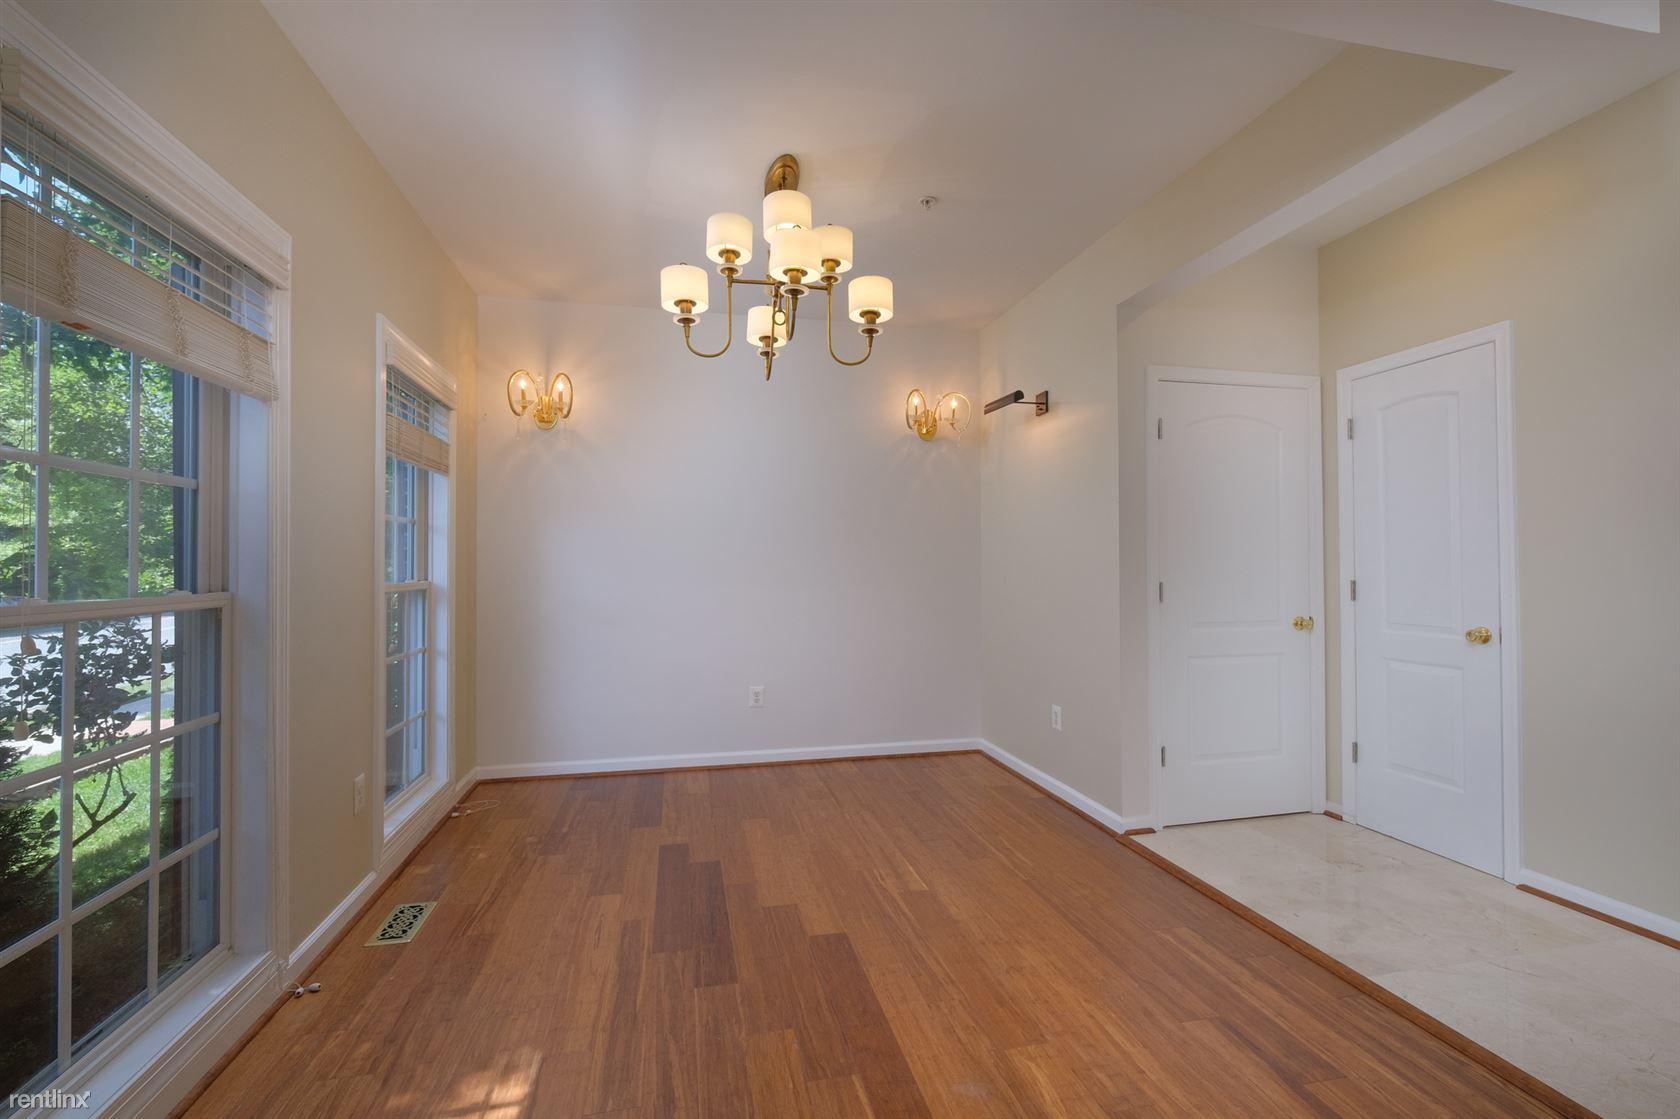 House for Rent in Clarksburg